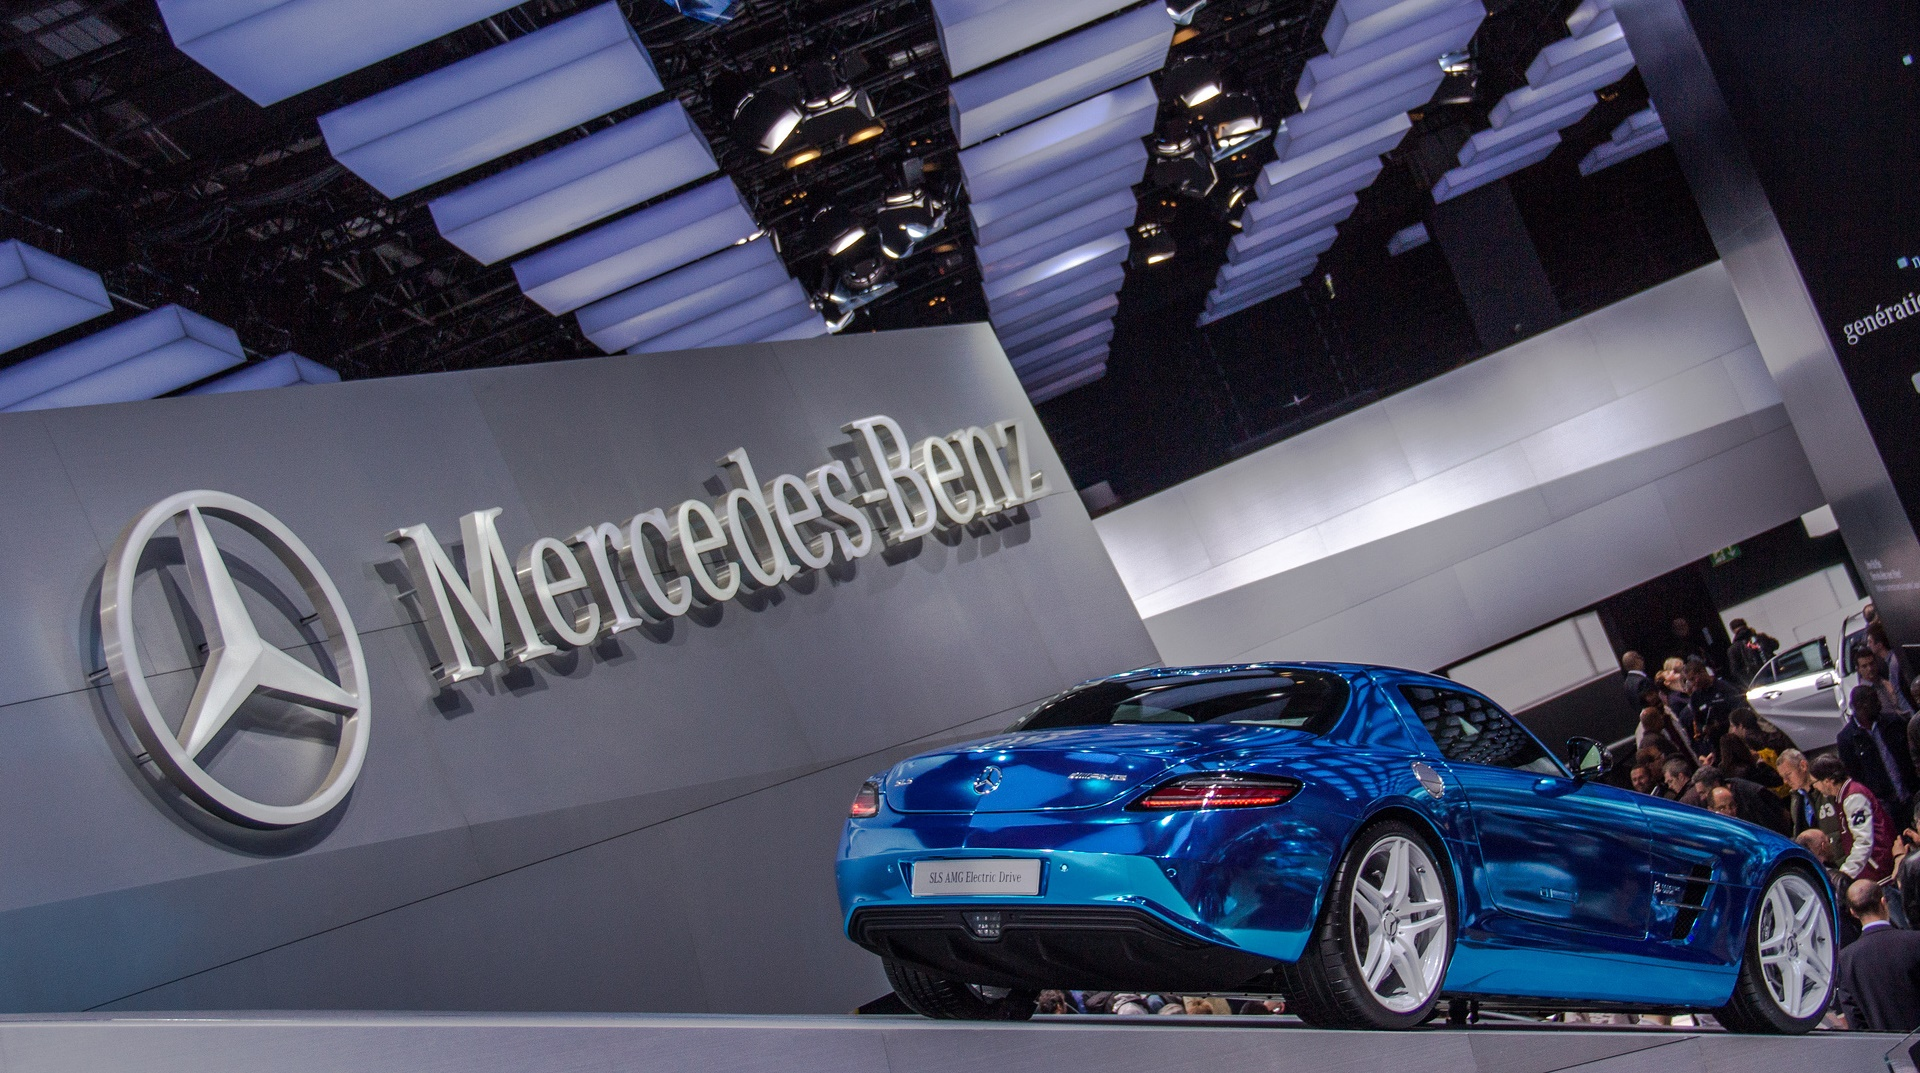 Daimler invierte 500 millones de euros en una fábrica de baterías